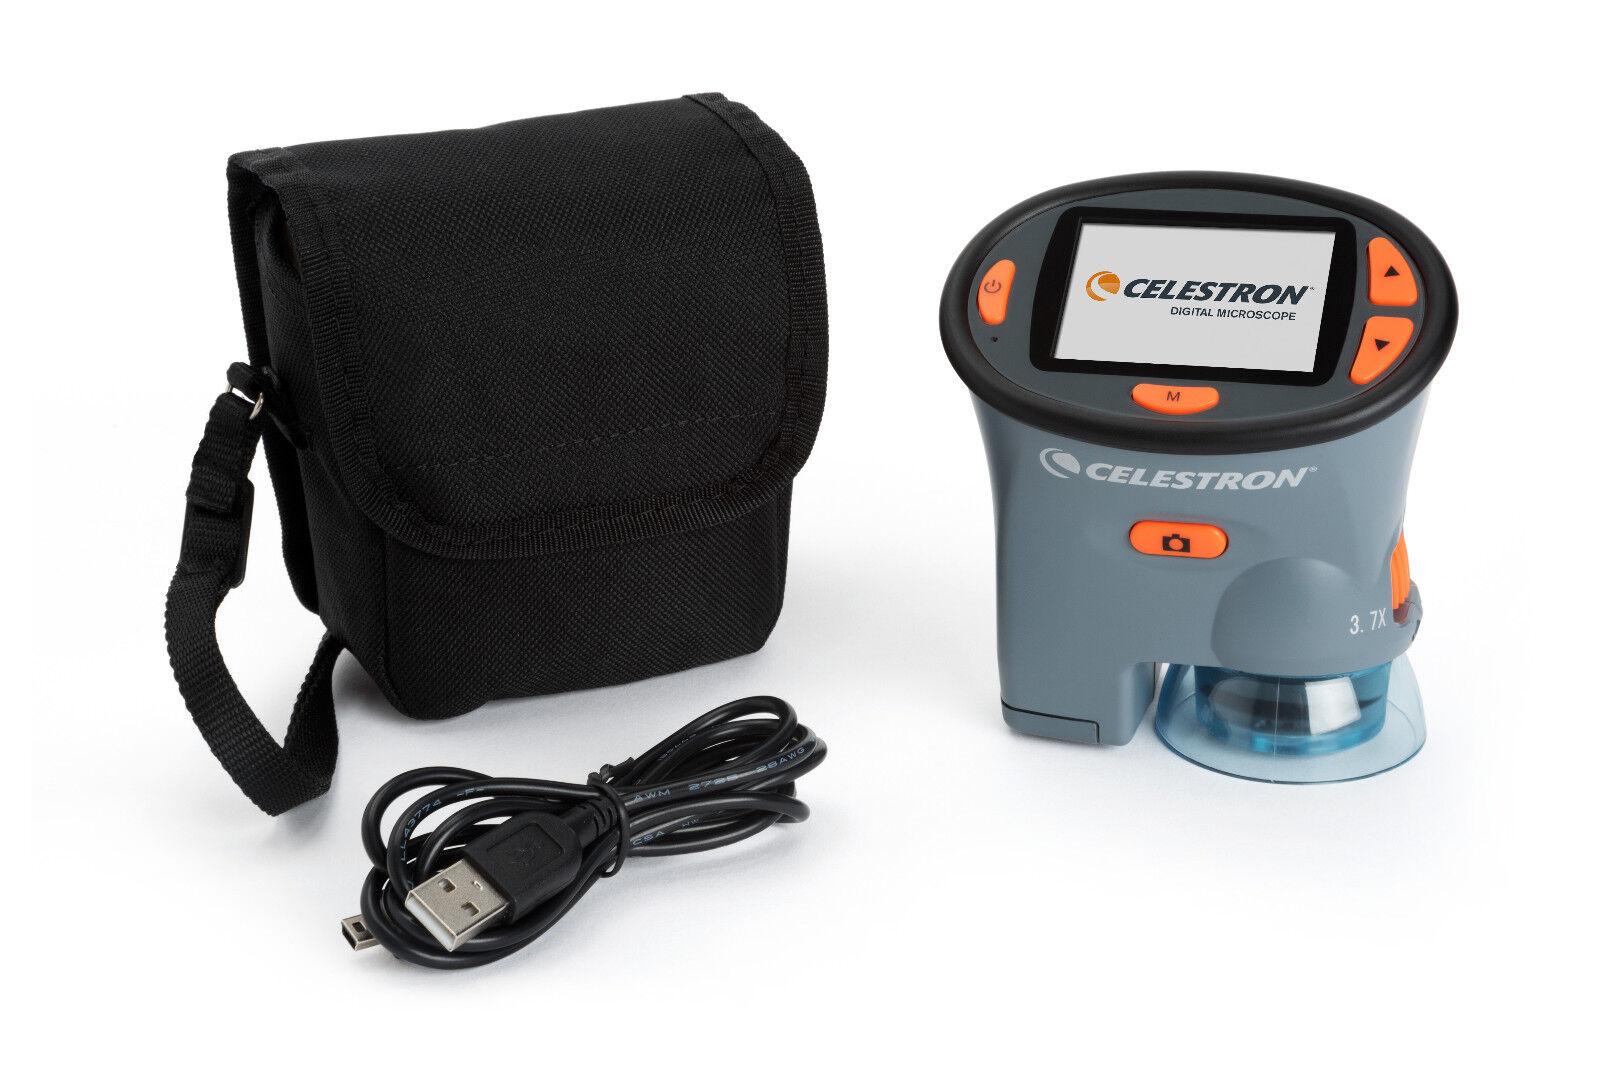 Celestron Digitales LCD Handmikroskop 3MP Kamera mobiles Mikroskop  2,4 -Monitor